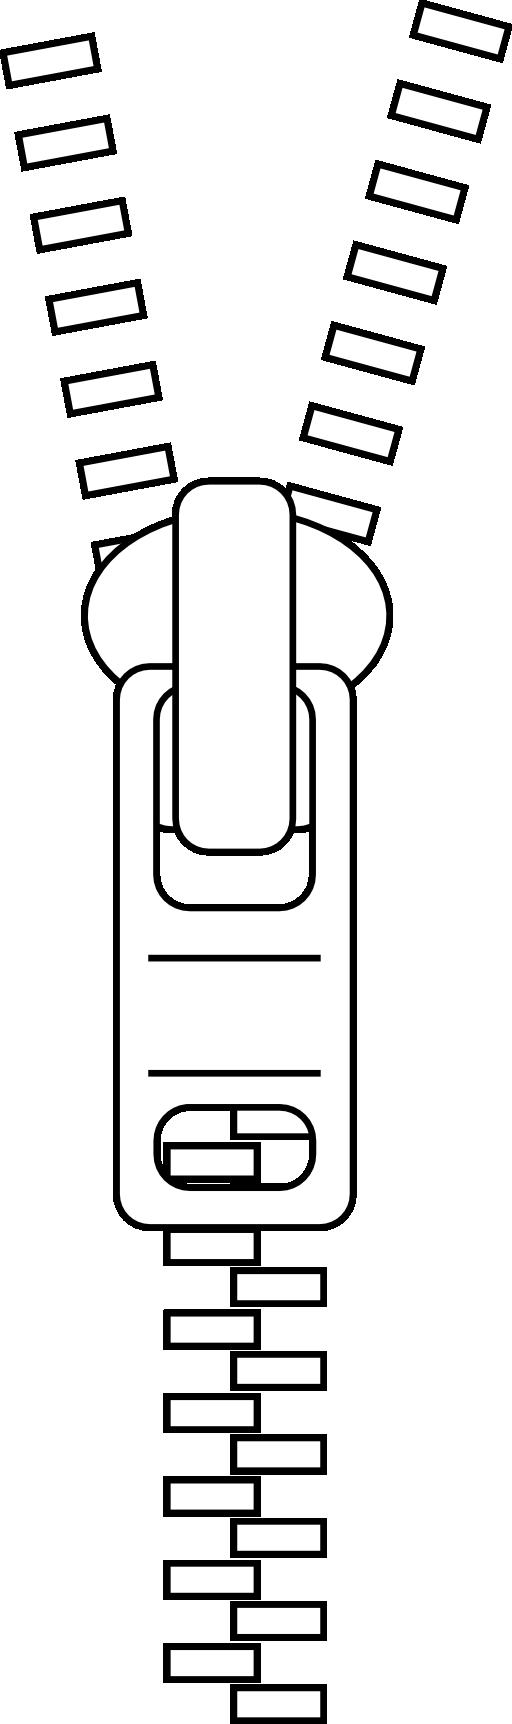 Zipper Line Art : Zip clipart i royalty free public domain